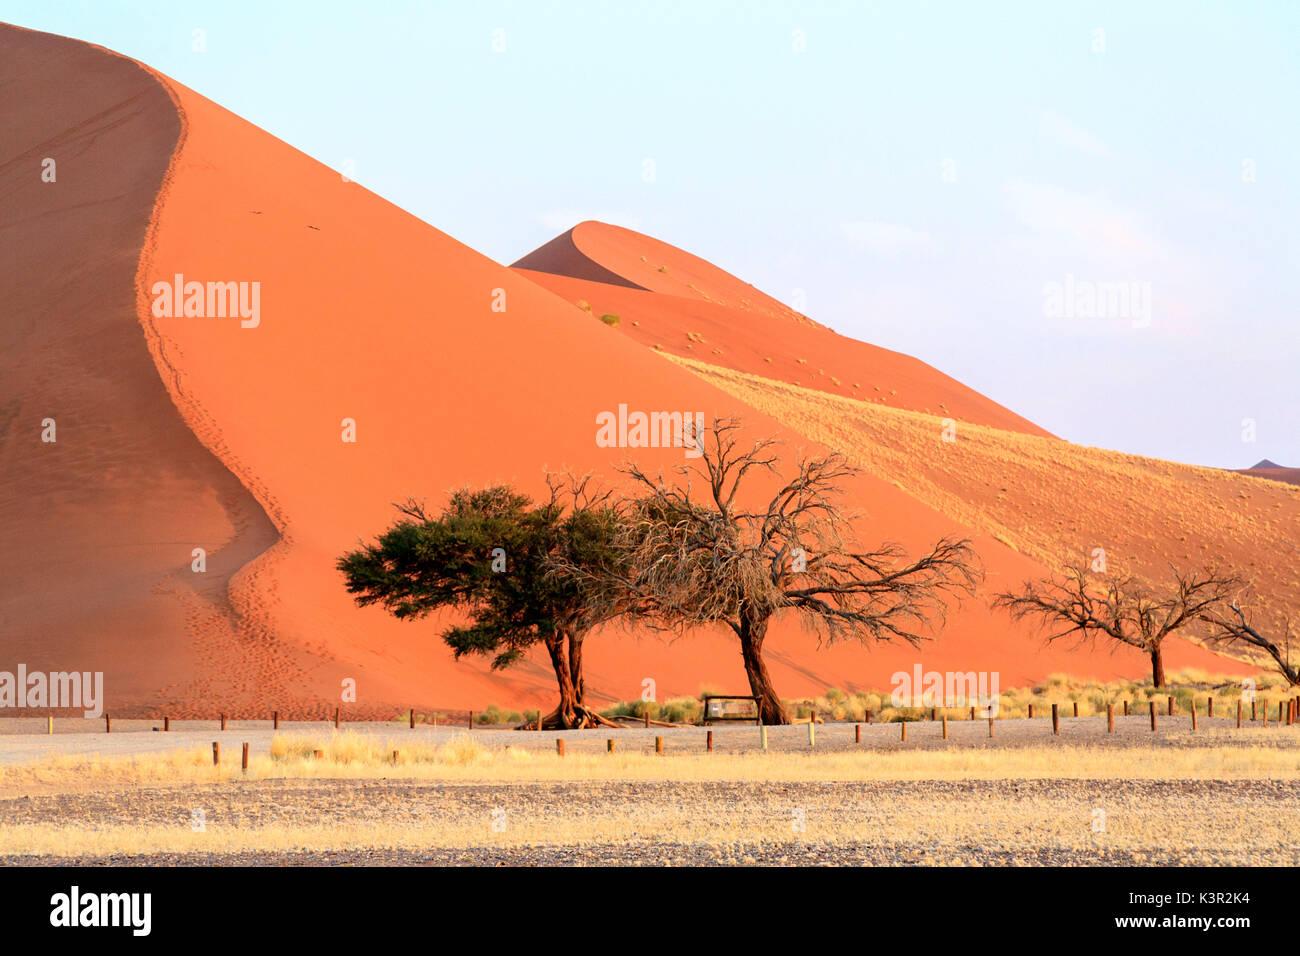 Dune 45 the star dune composed of 5 million year old sand Sossusvlei Namib Desert Naukluft National Park in Namibia Stock Photo